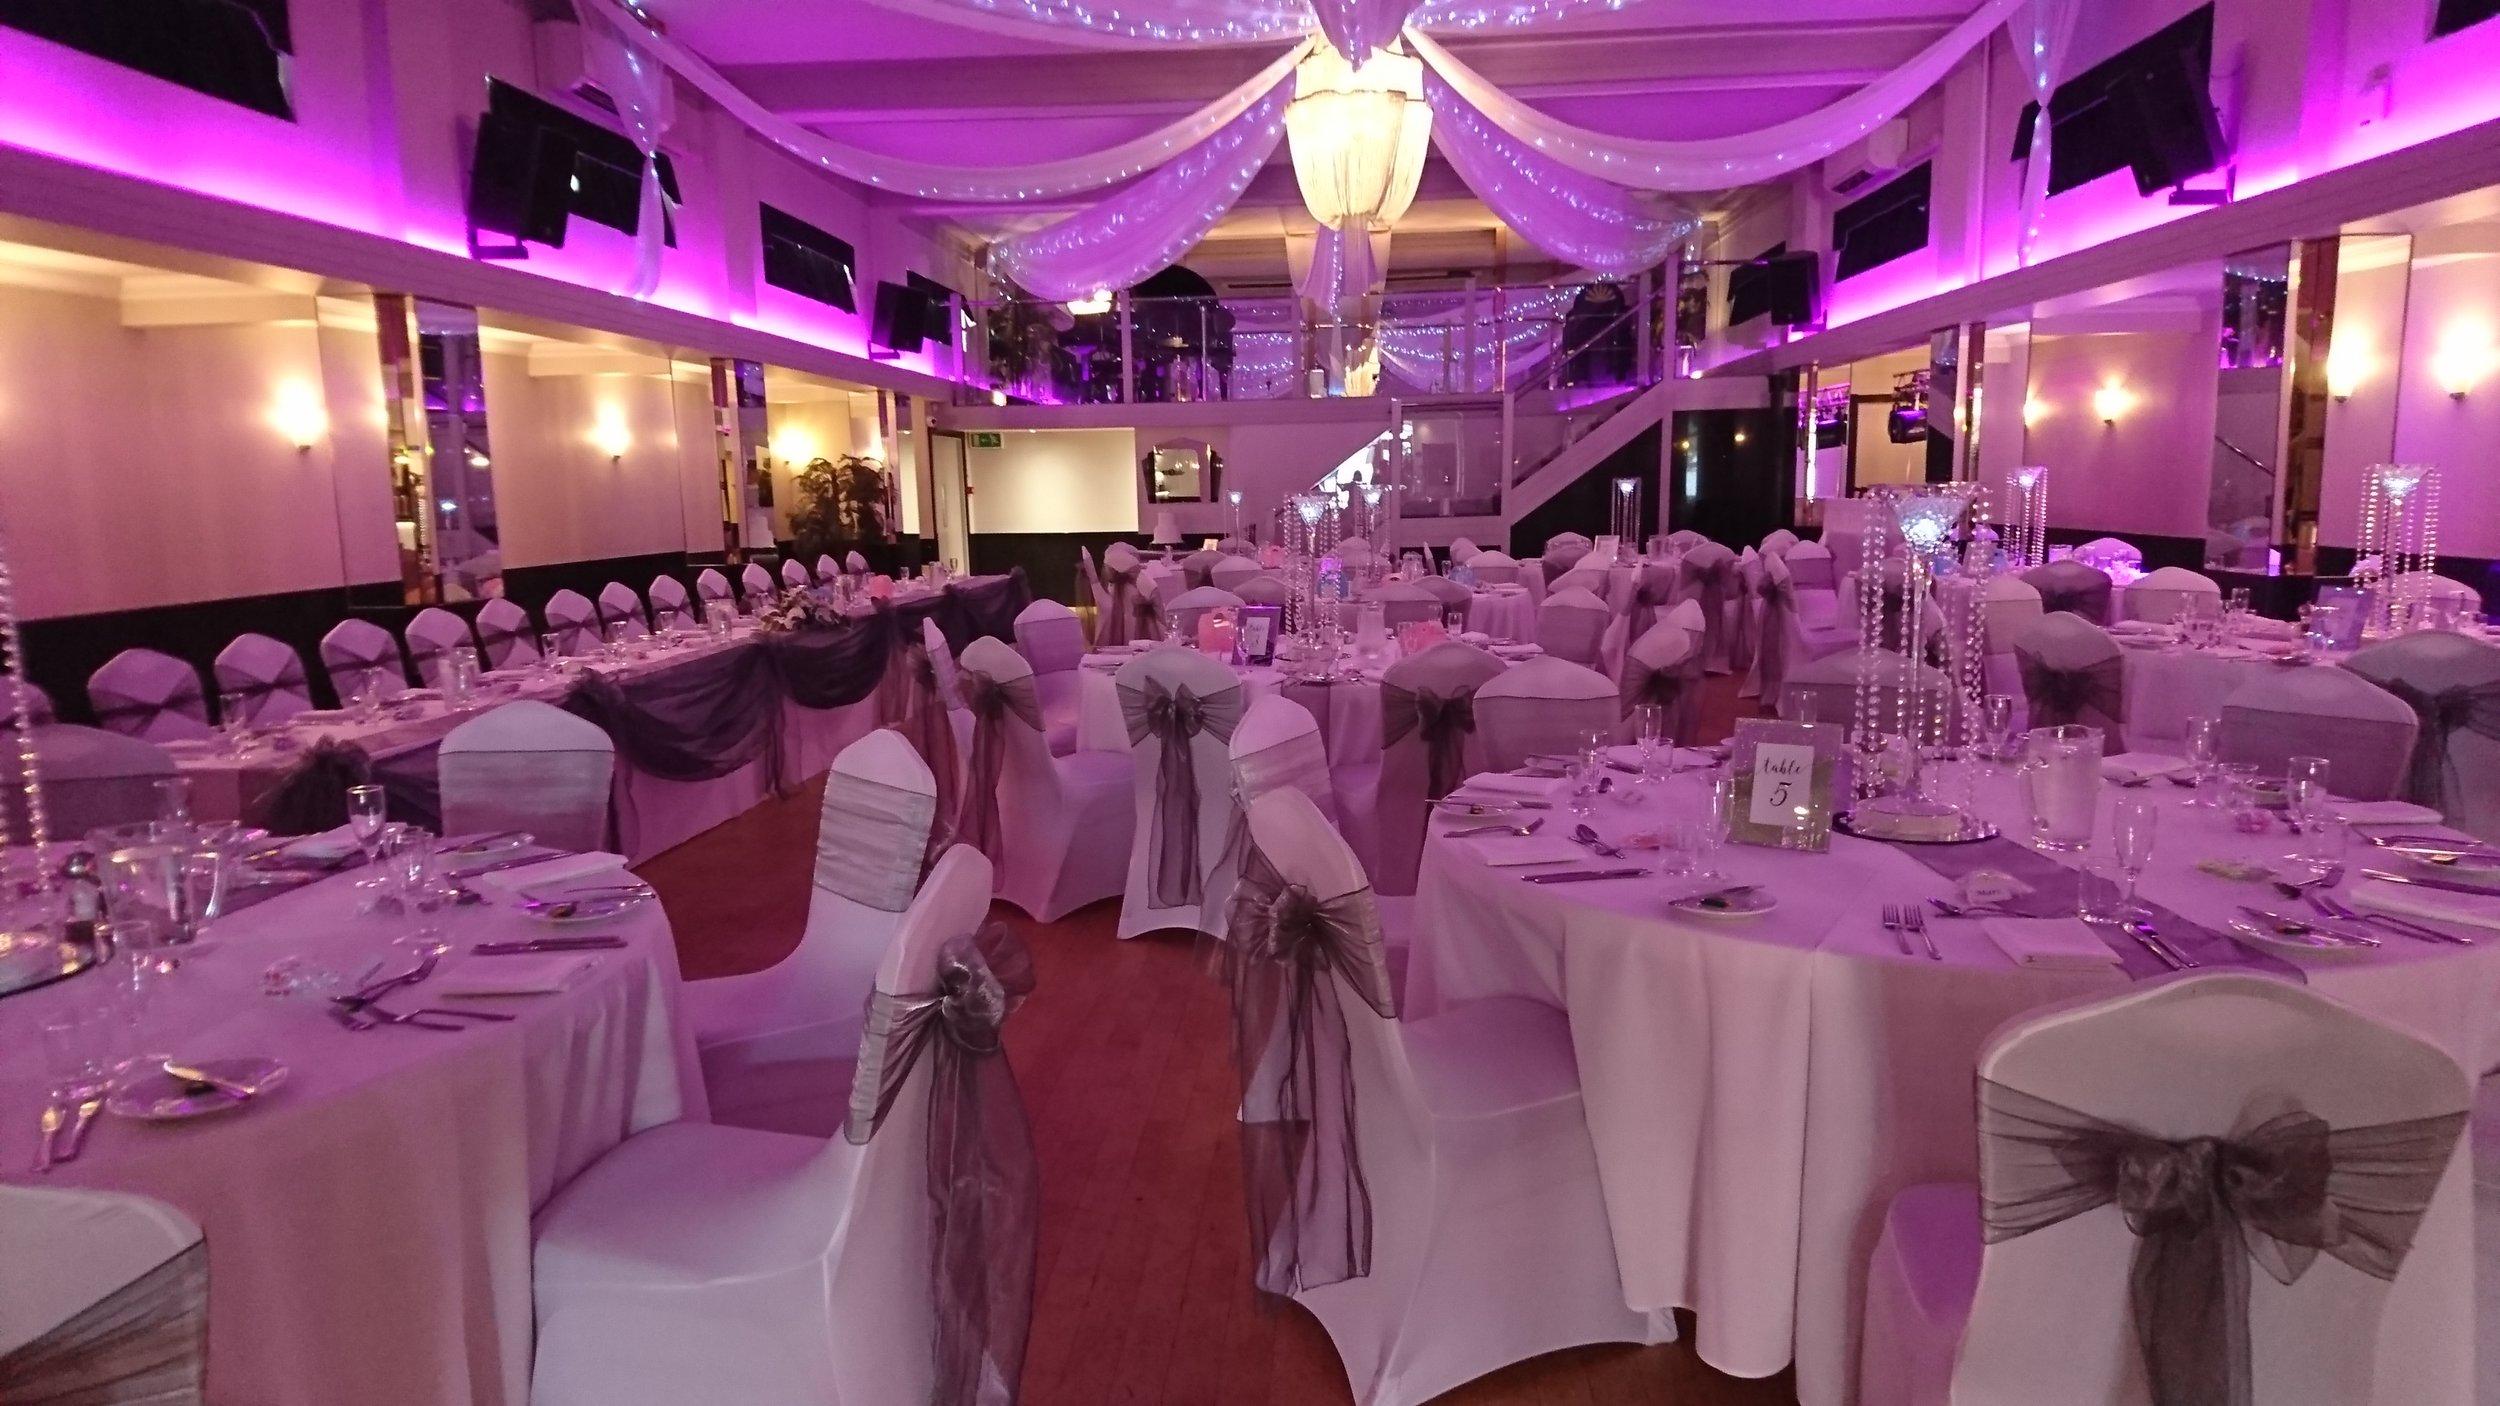 Pink Downlighting, Rosie and Daniel, 24th August 2019 - The Arlington Ballroom Essex